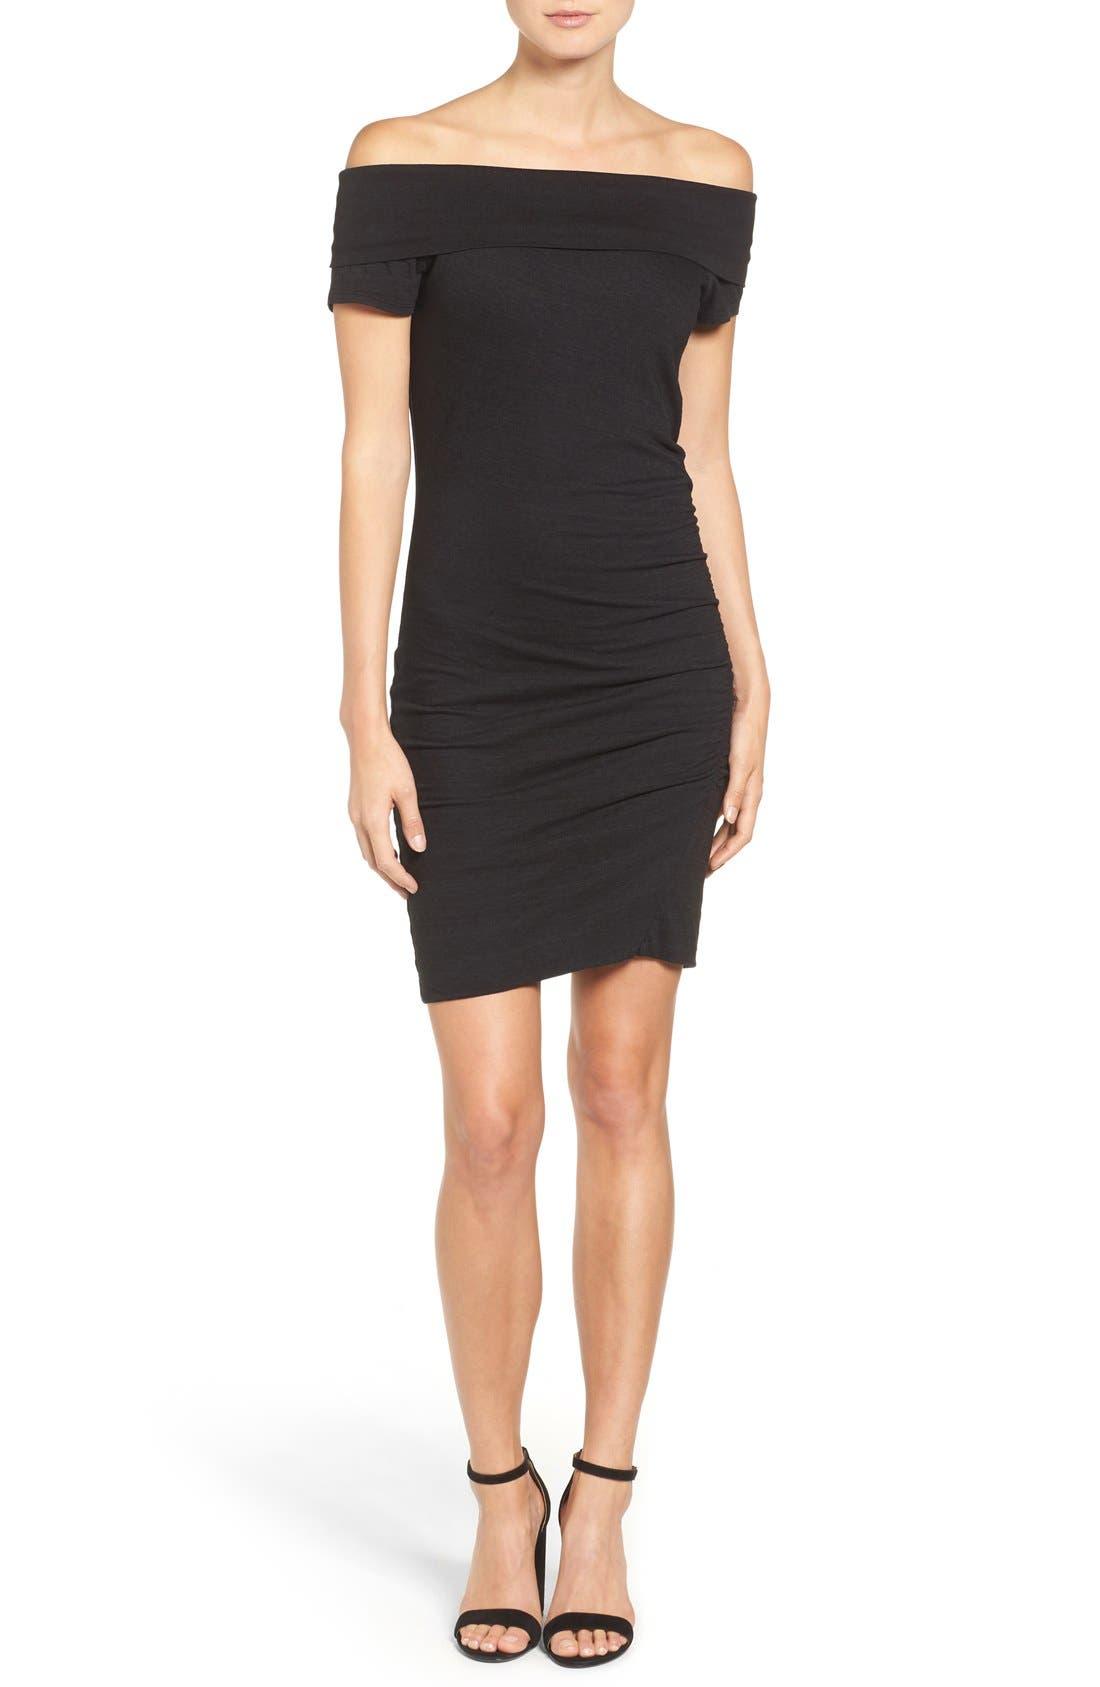 Main Image - Pam & Gela Off the Shoulder Body-Con Dress